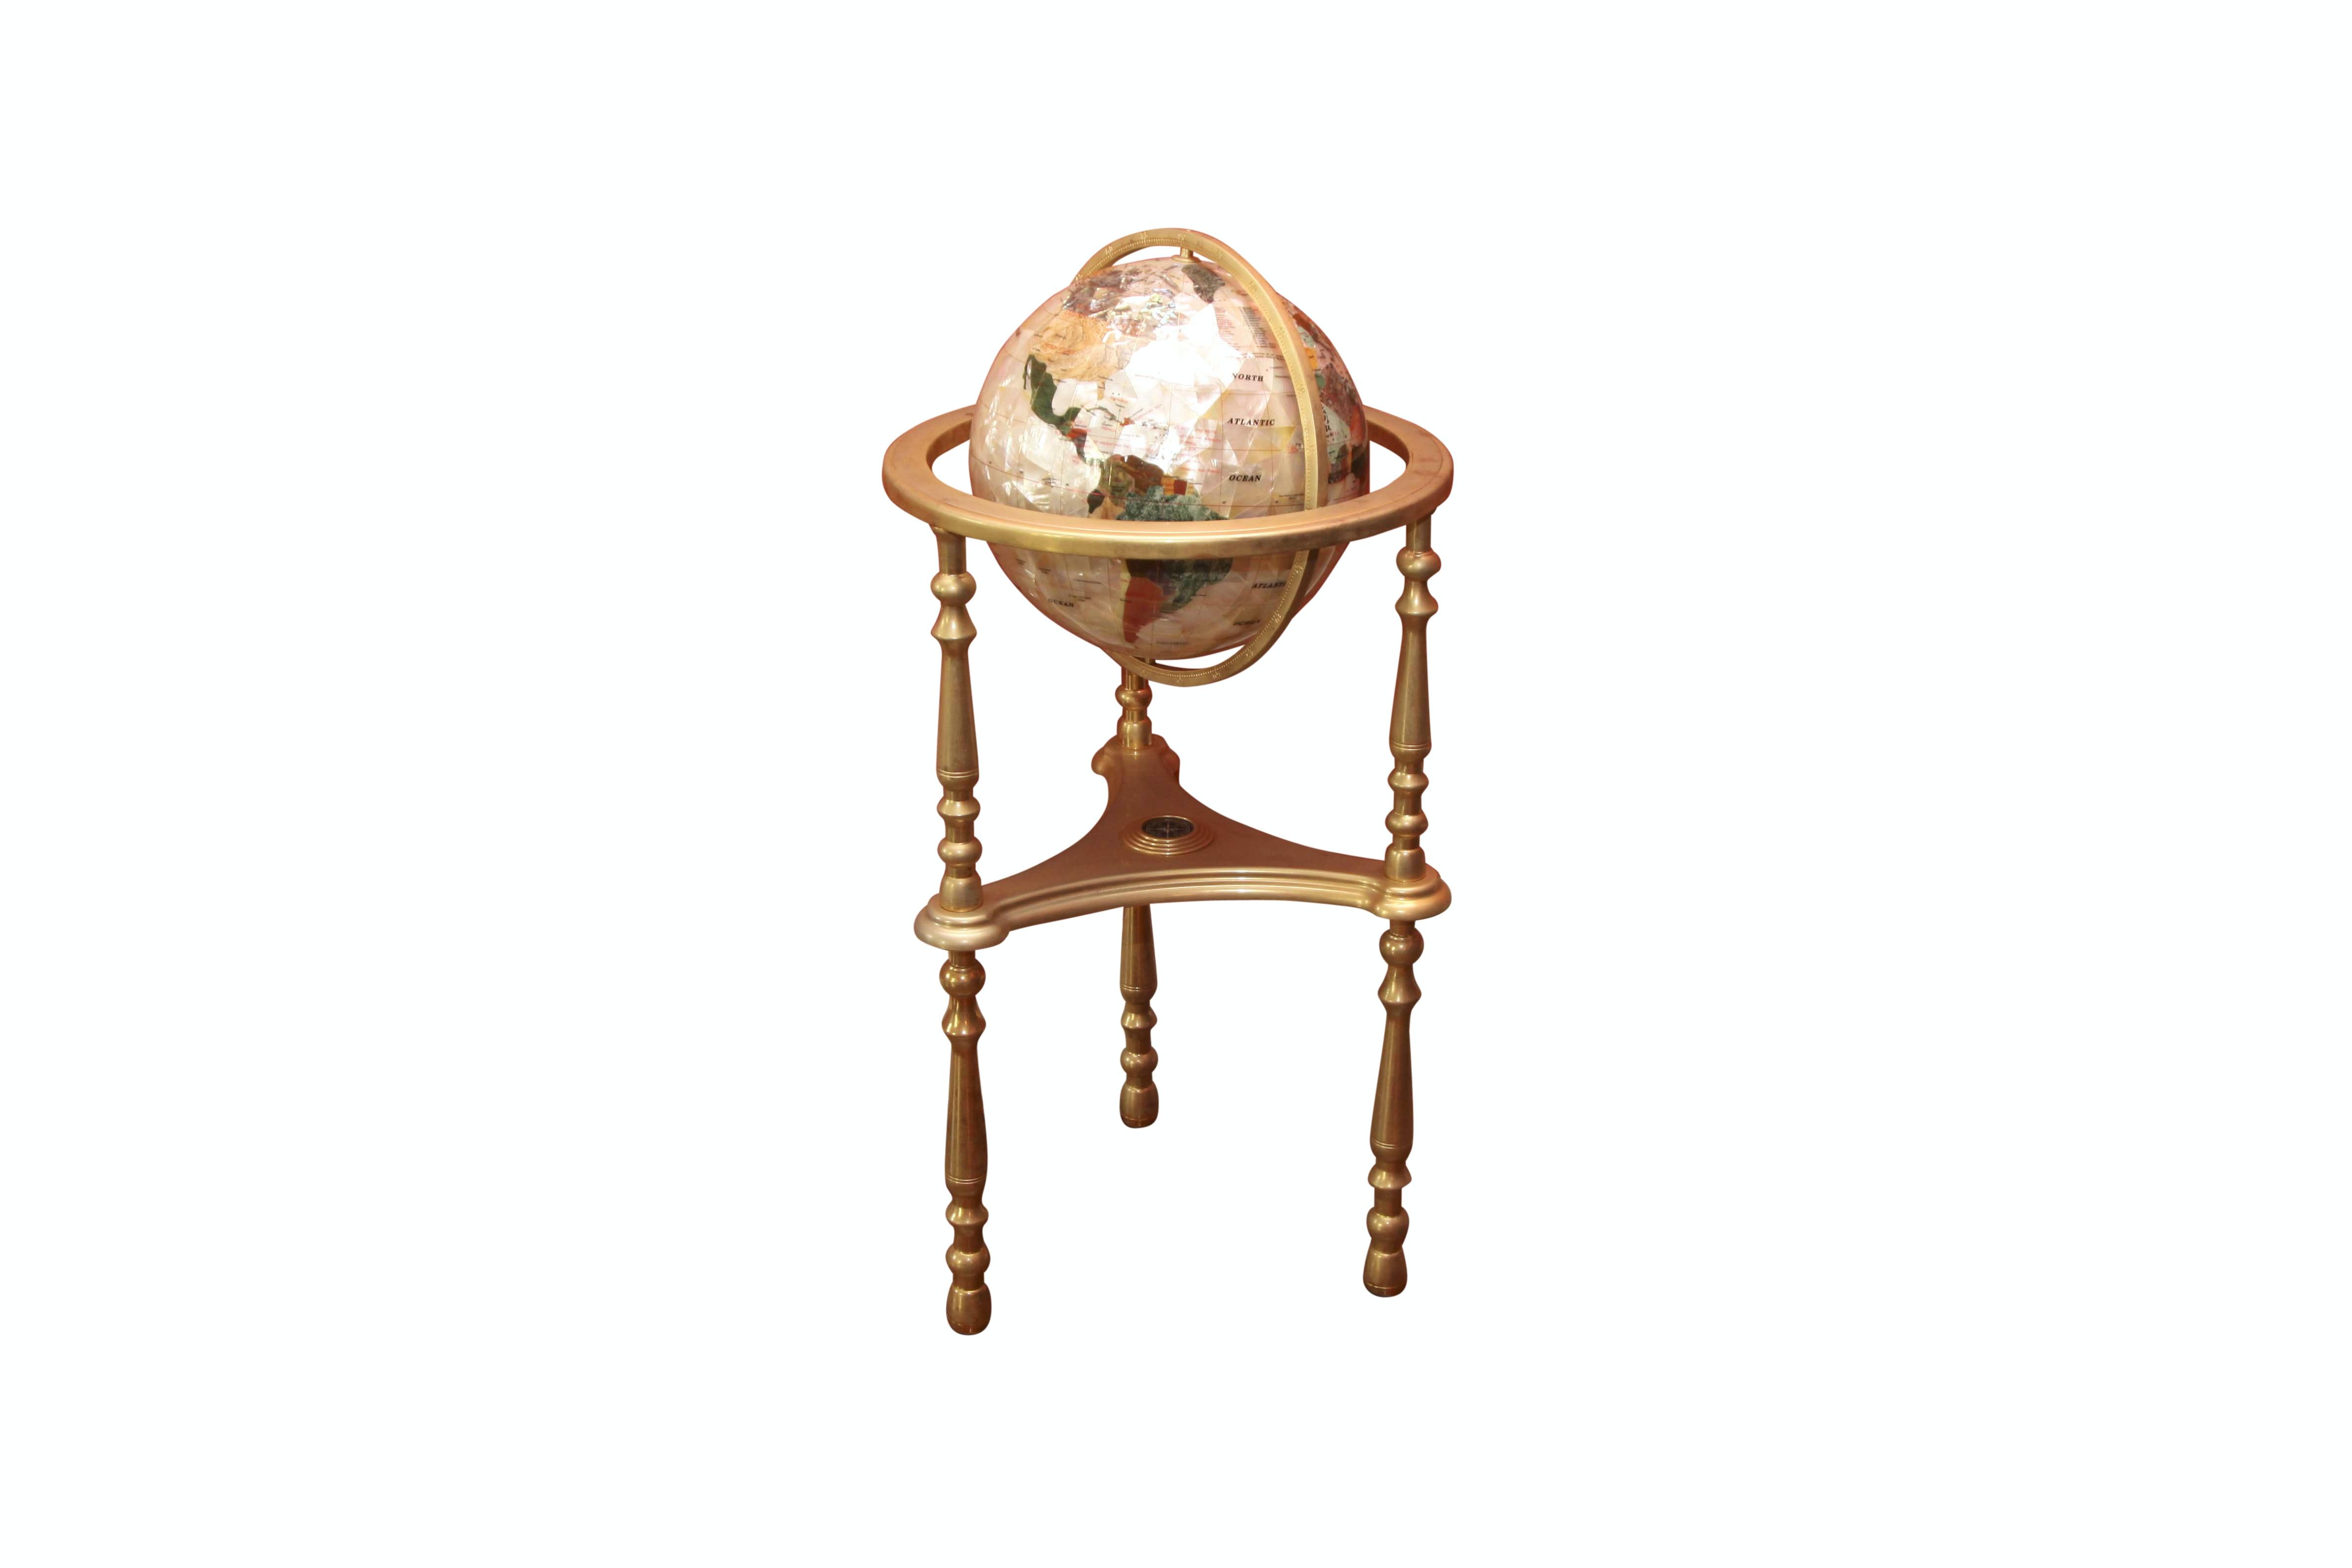 Mother of Pearl and Semi Precious Stone Globe